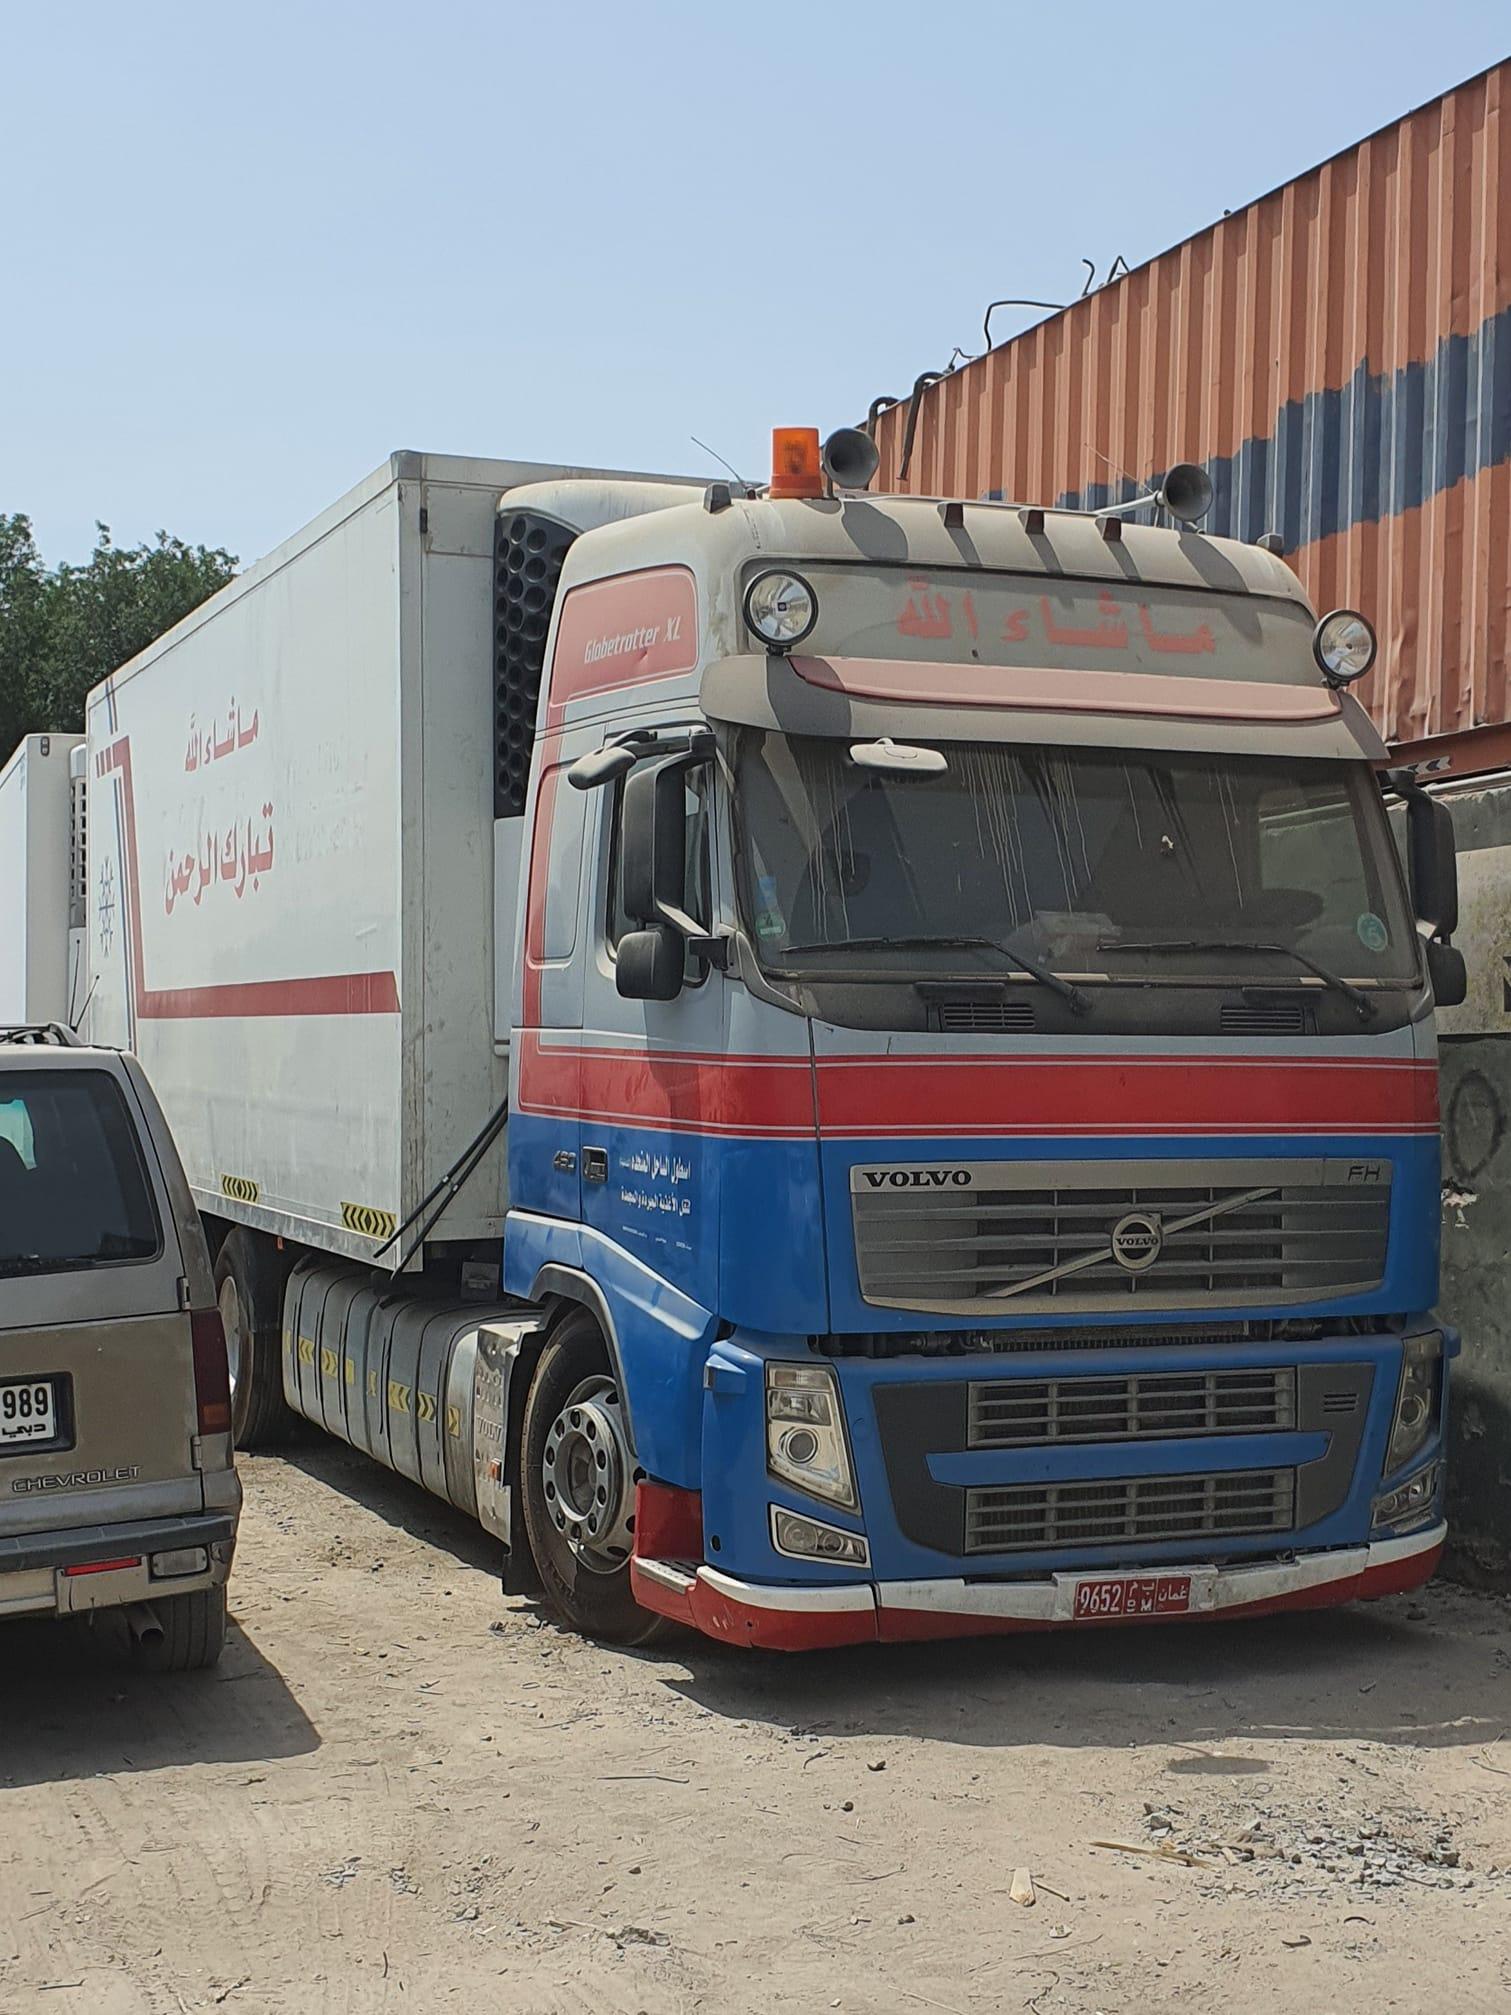 Bakker--Dubai-VAE--ex-Eddy-Beer-Volvo